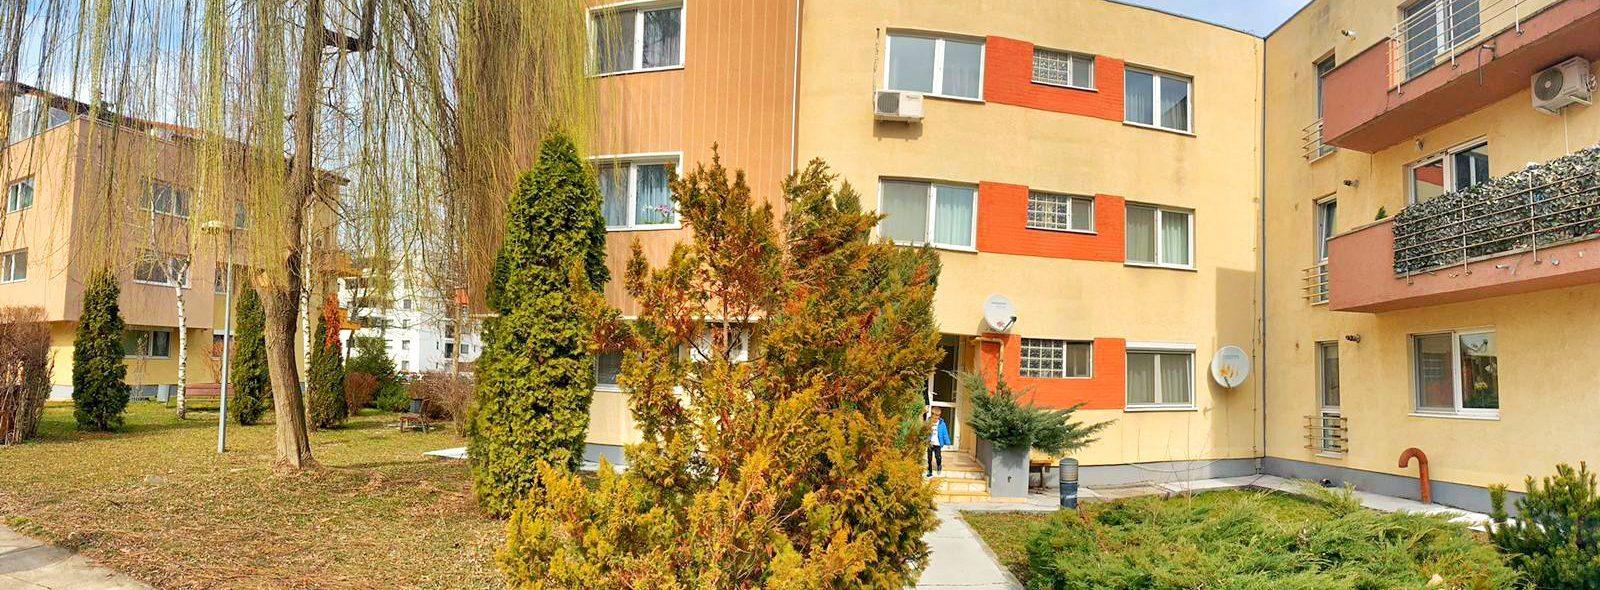 Inchiriere Apartament 3 camere Bucuresti, Baneasa poza principala